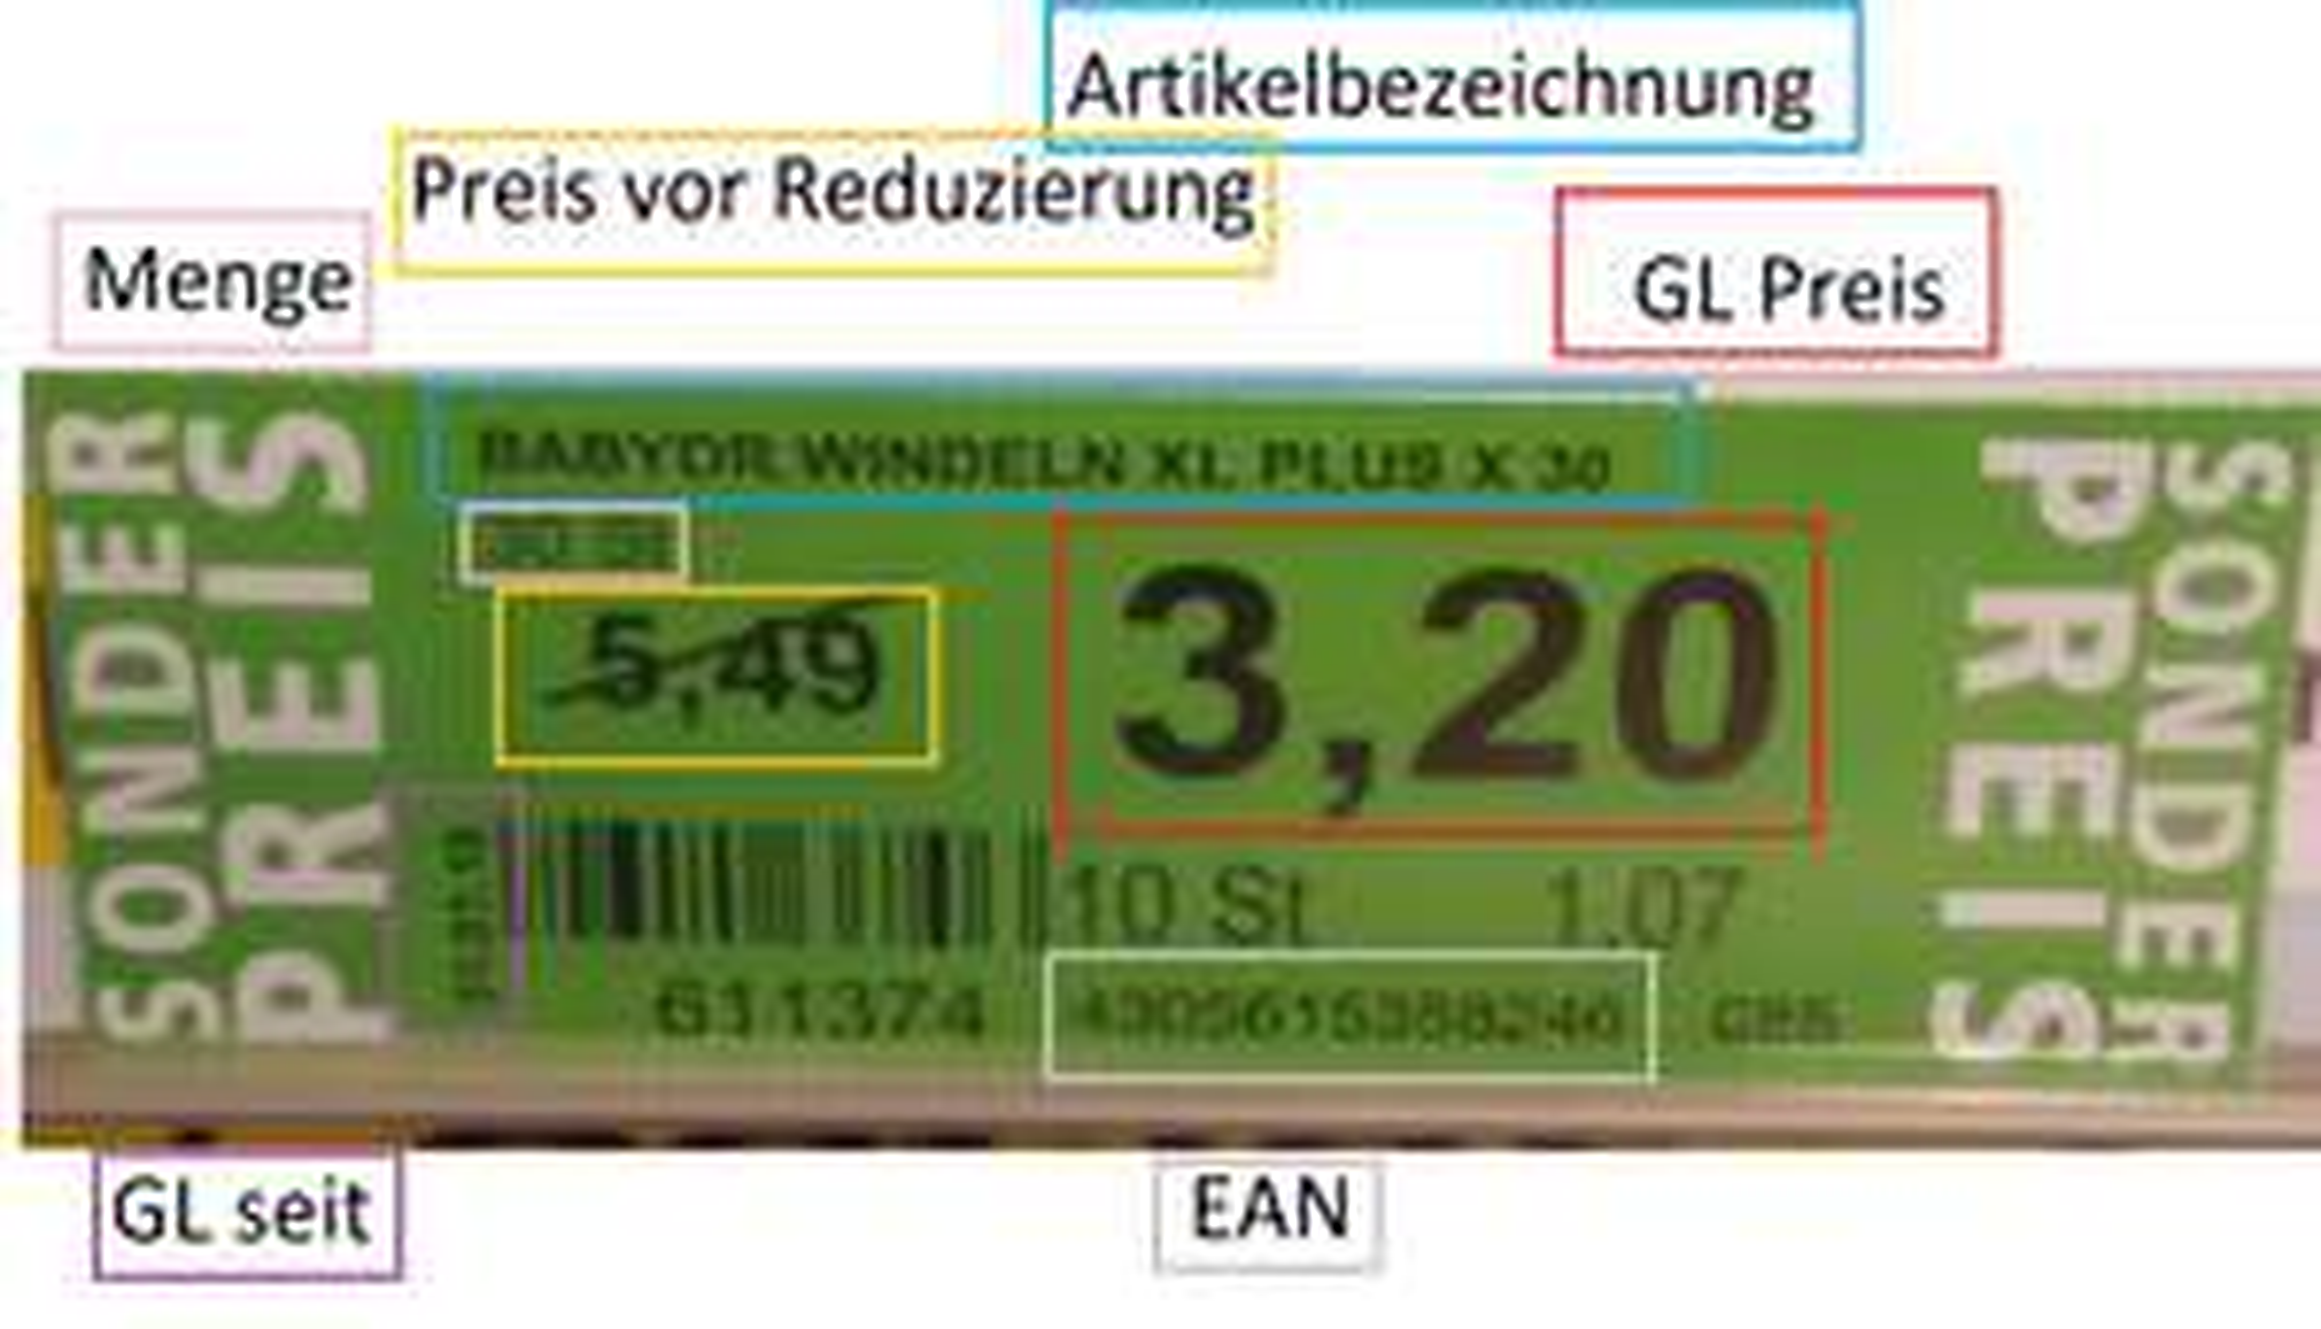 [ROSSMANN] Green Label Preise ab 11.04.18 - KW 15 / bundesweit / GL